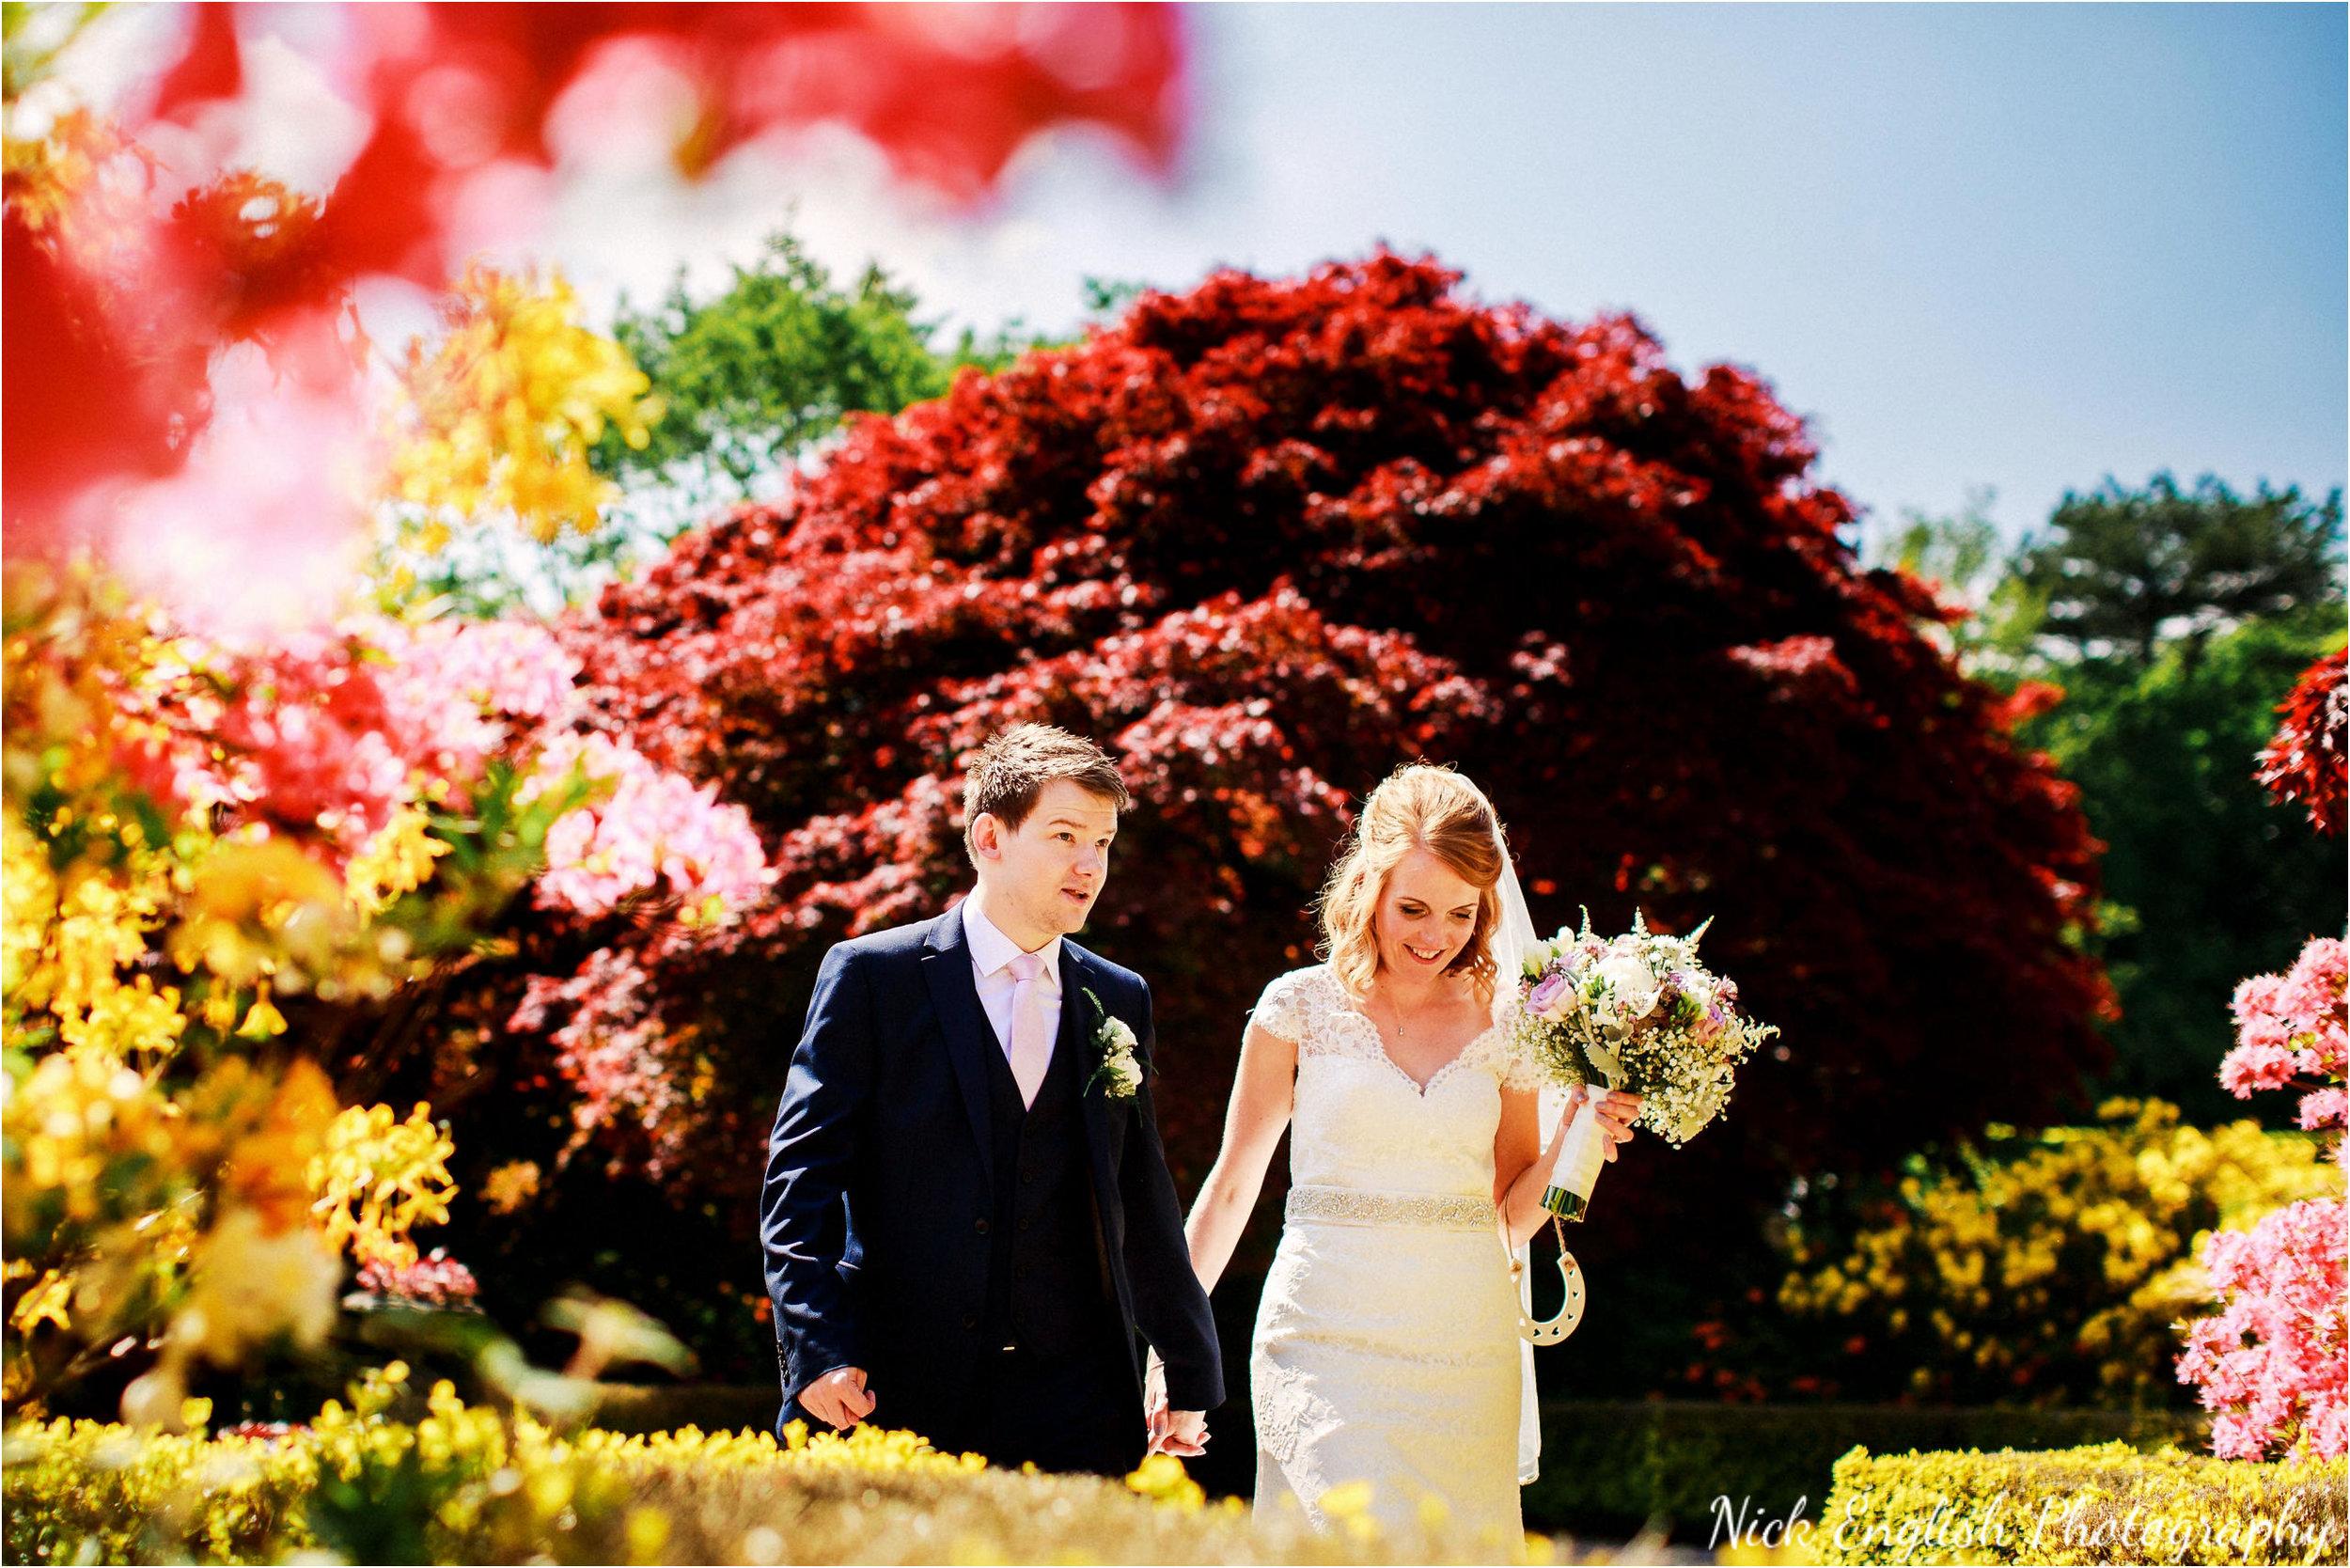 Alison James Wedding Photographs at Eaves Hall West Bradford 126jpg.jpeg